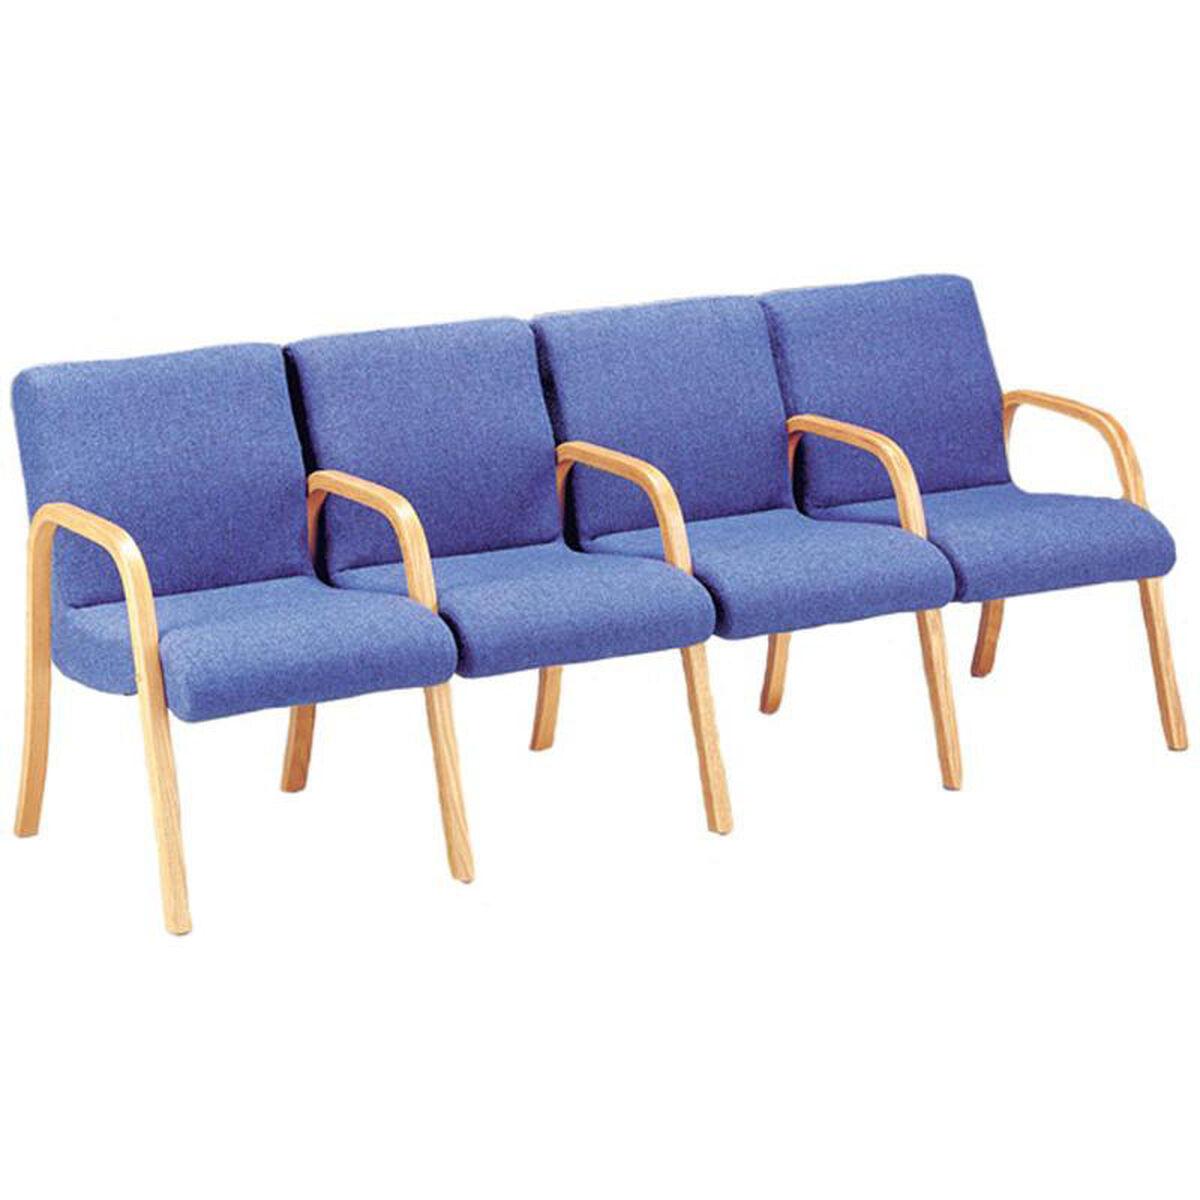 High Point Furniture Industries 1003 Hpf 1003